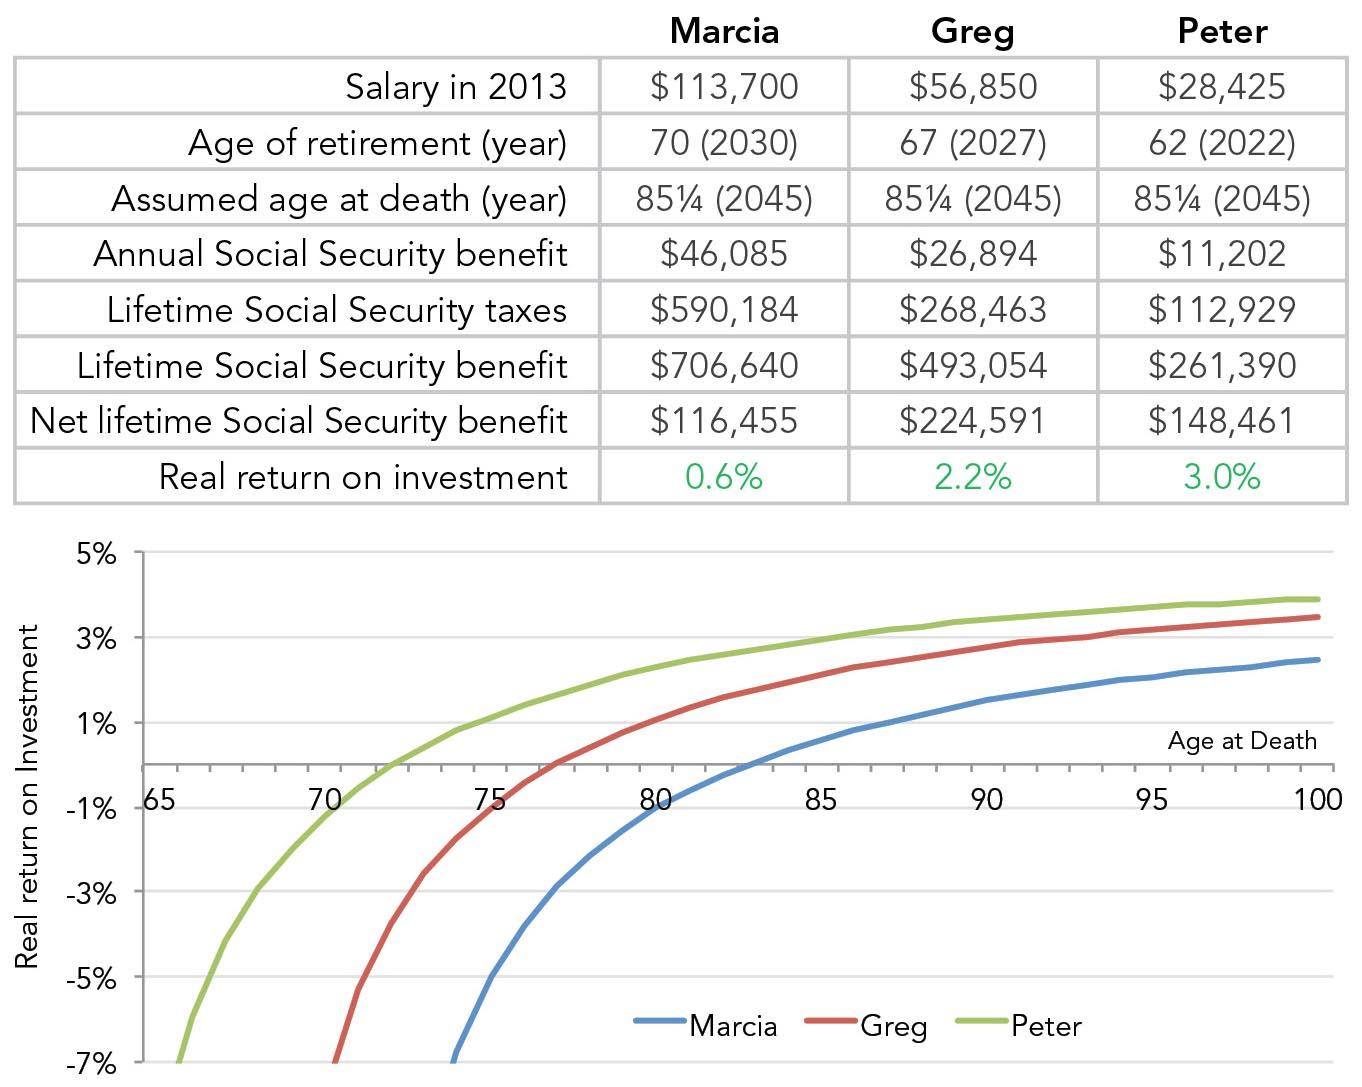 Scenario 3: Employee plus employer, different retirement ages